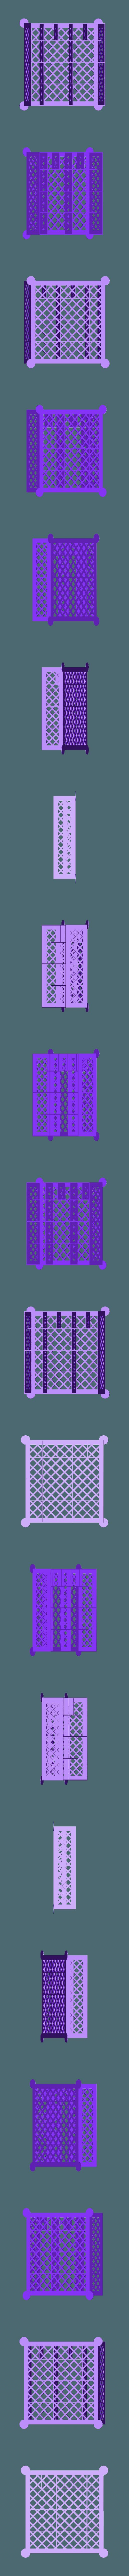 HellBatsAndheroesModifiedMouse.stl Download free STL file Shadows of brimstone box organizer • 3D print object, gthanatos